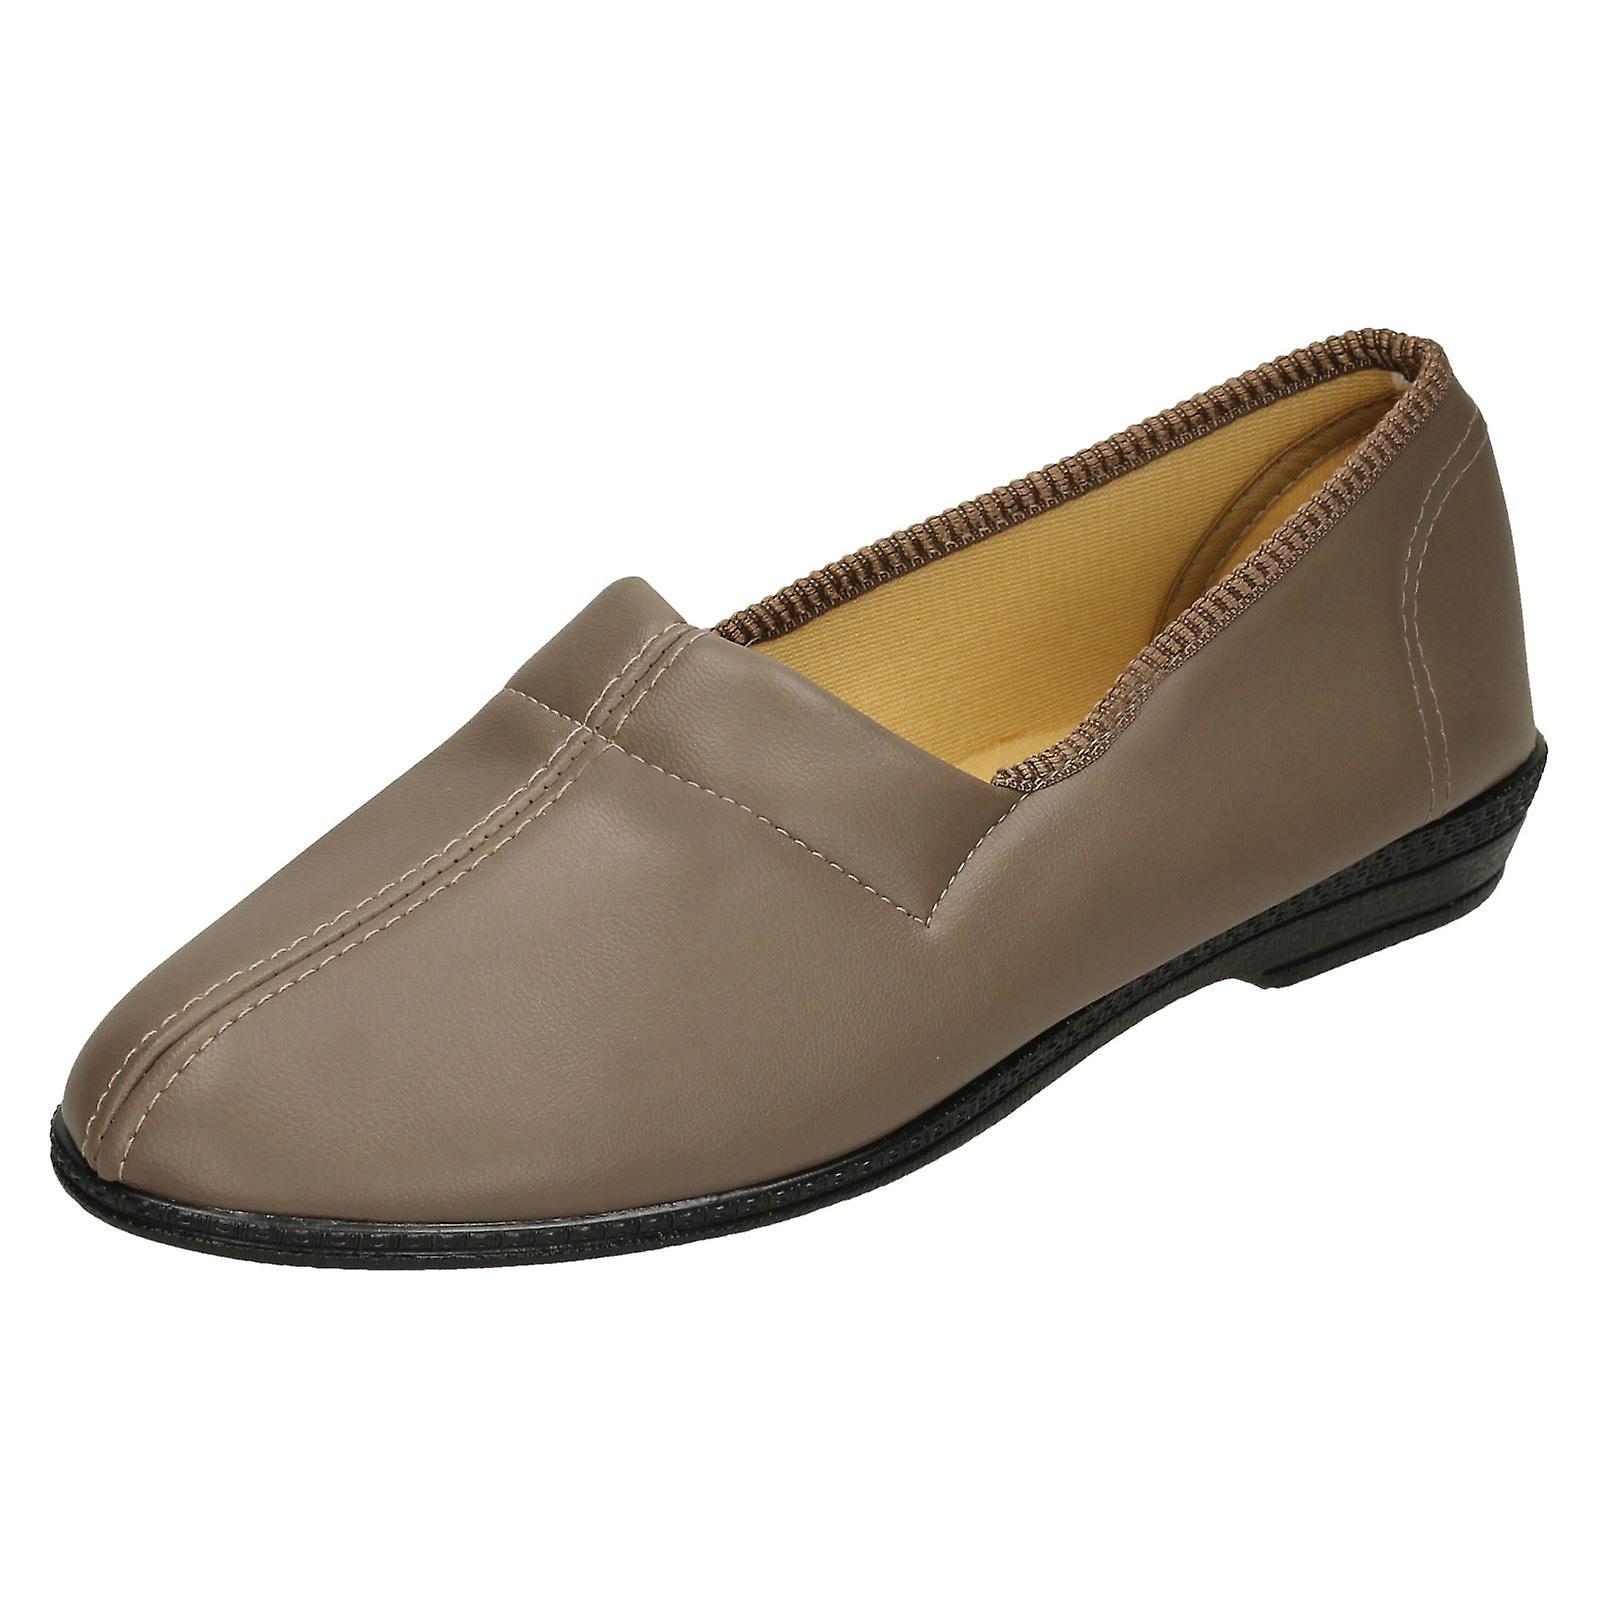 A buon mercato Ladies Ladylove Indoor pantofole LJ42R alta qualità